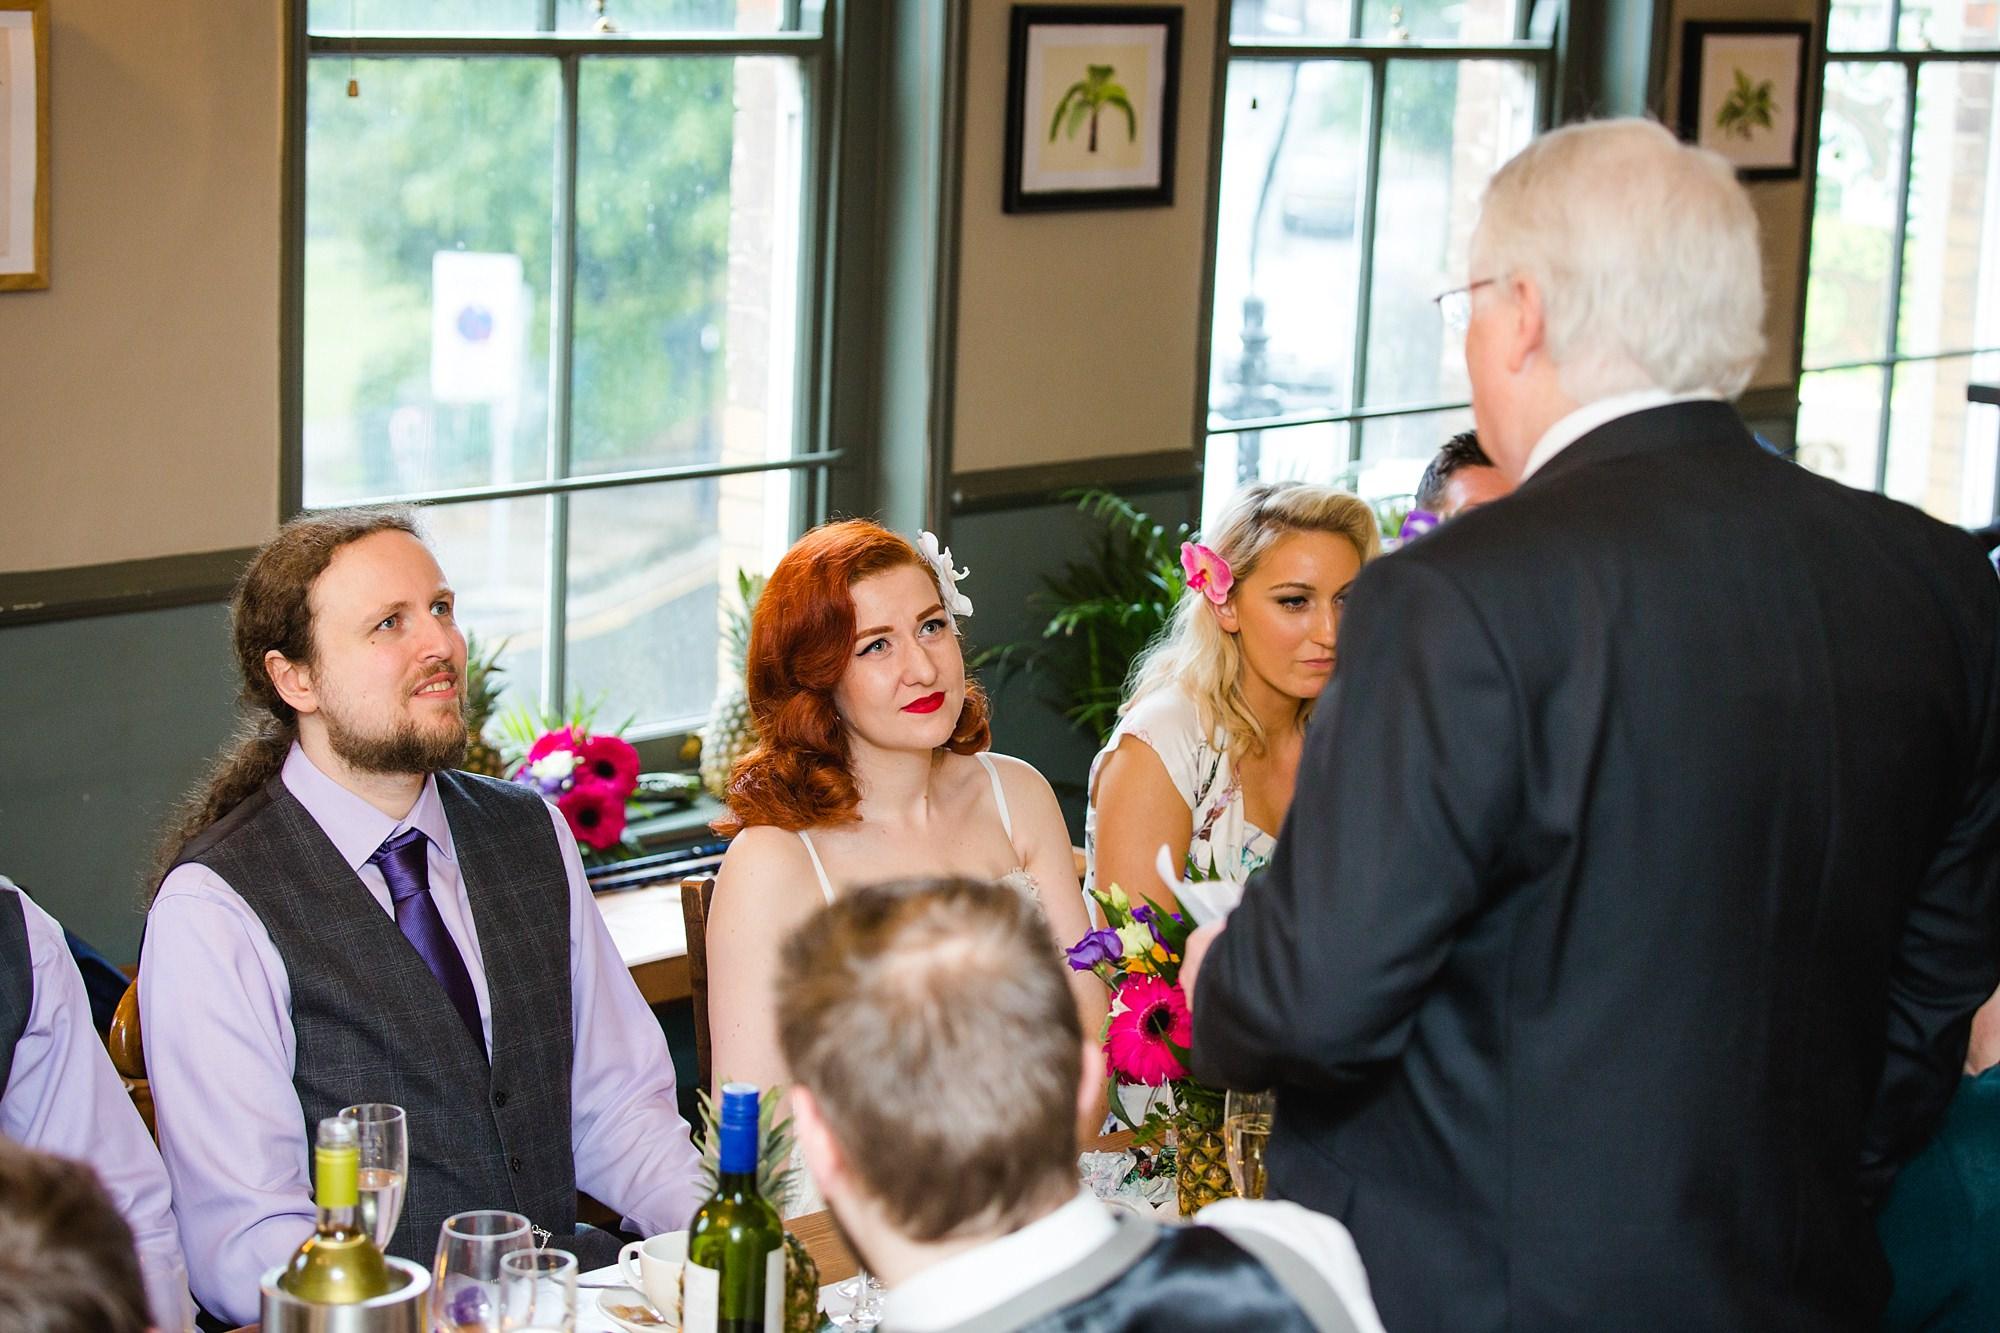 The Grange Ealing wedding bride and groom listen to speech